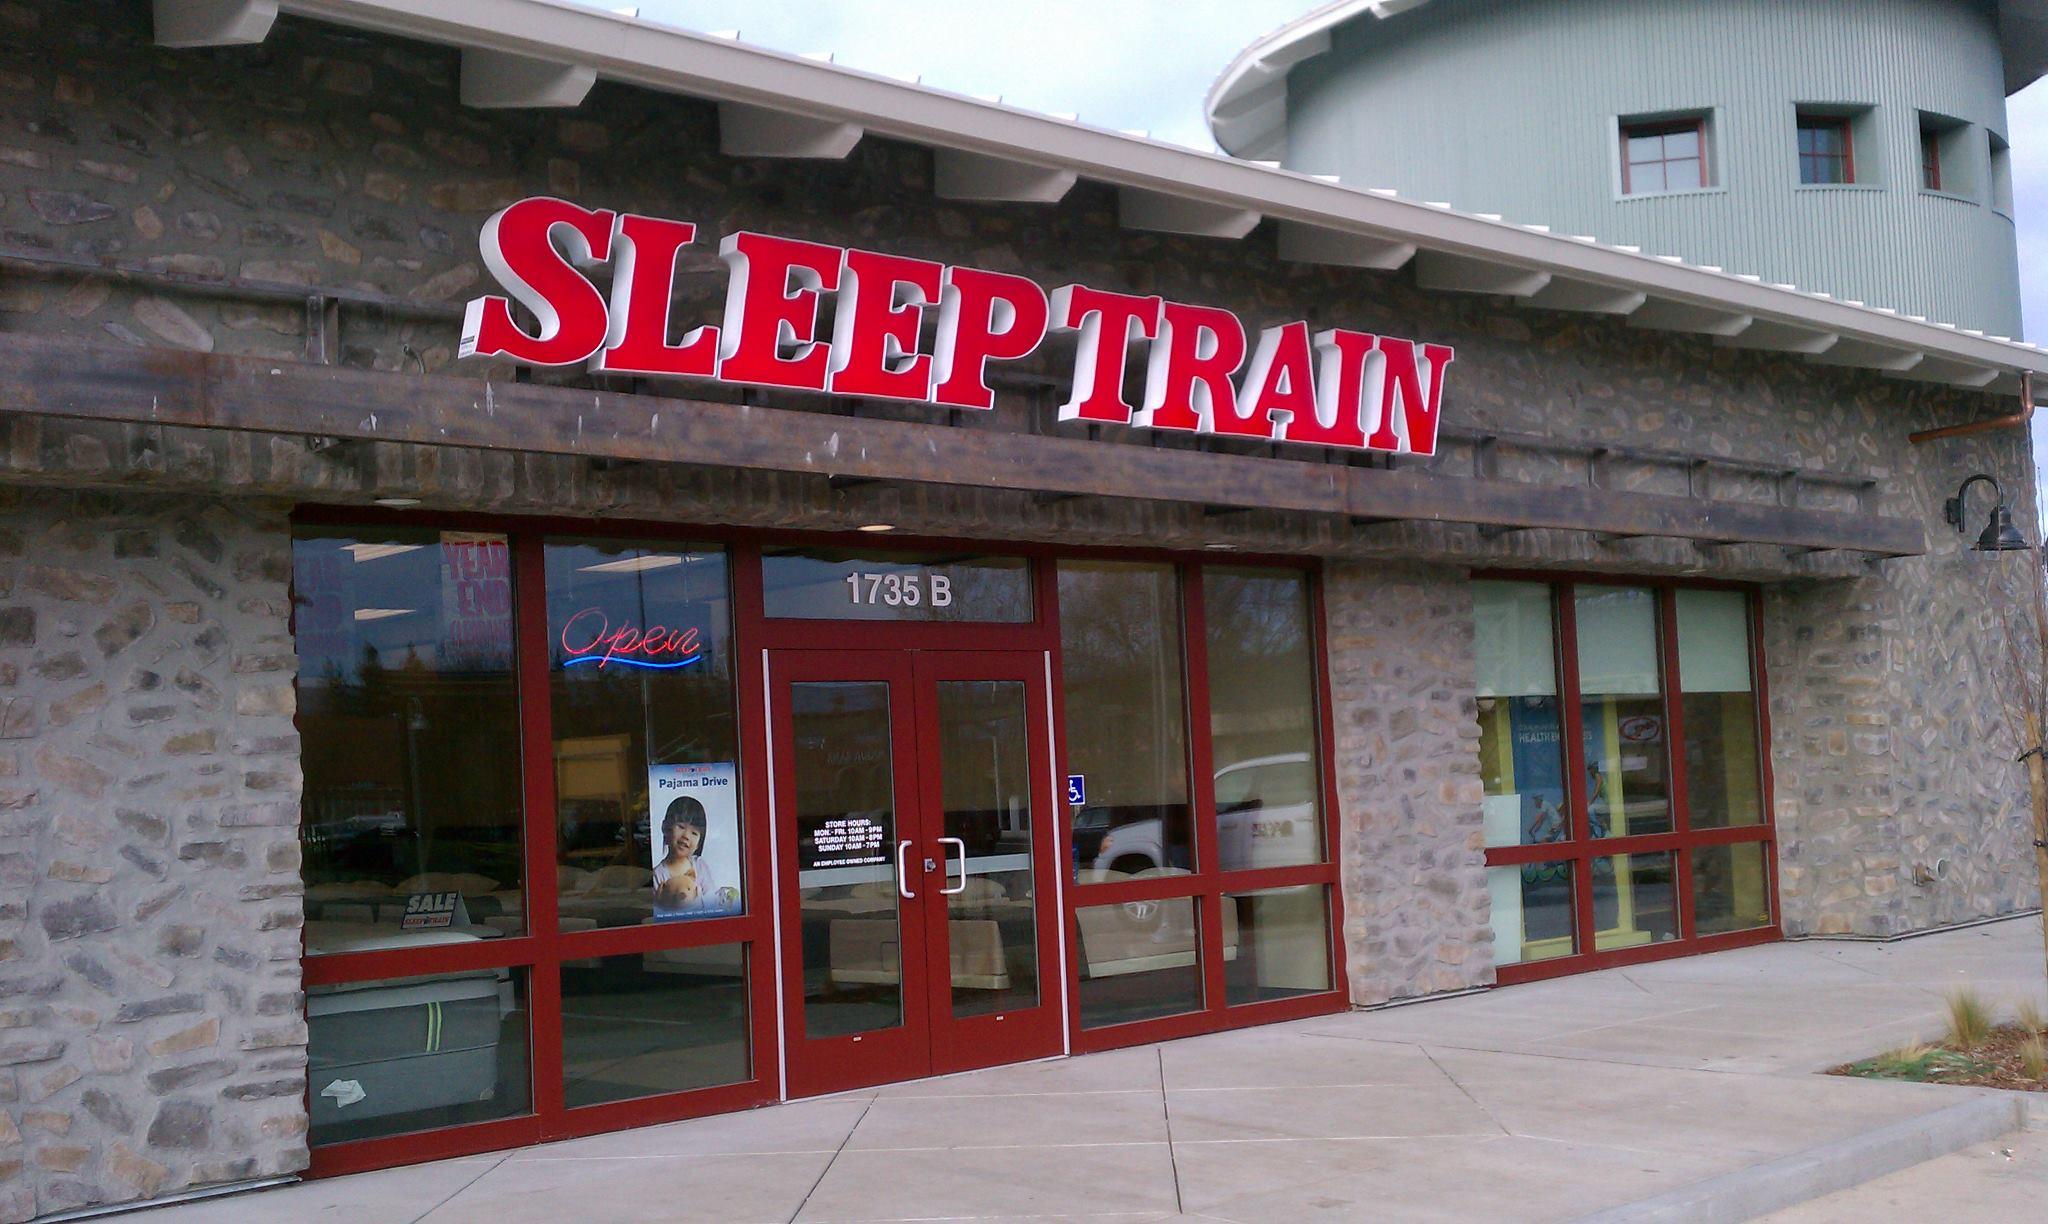 Napa-sleeptrain.jpg